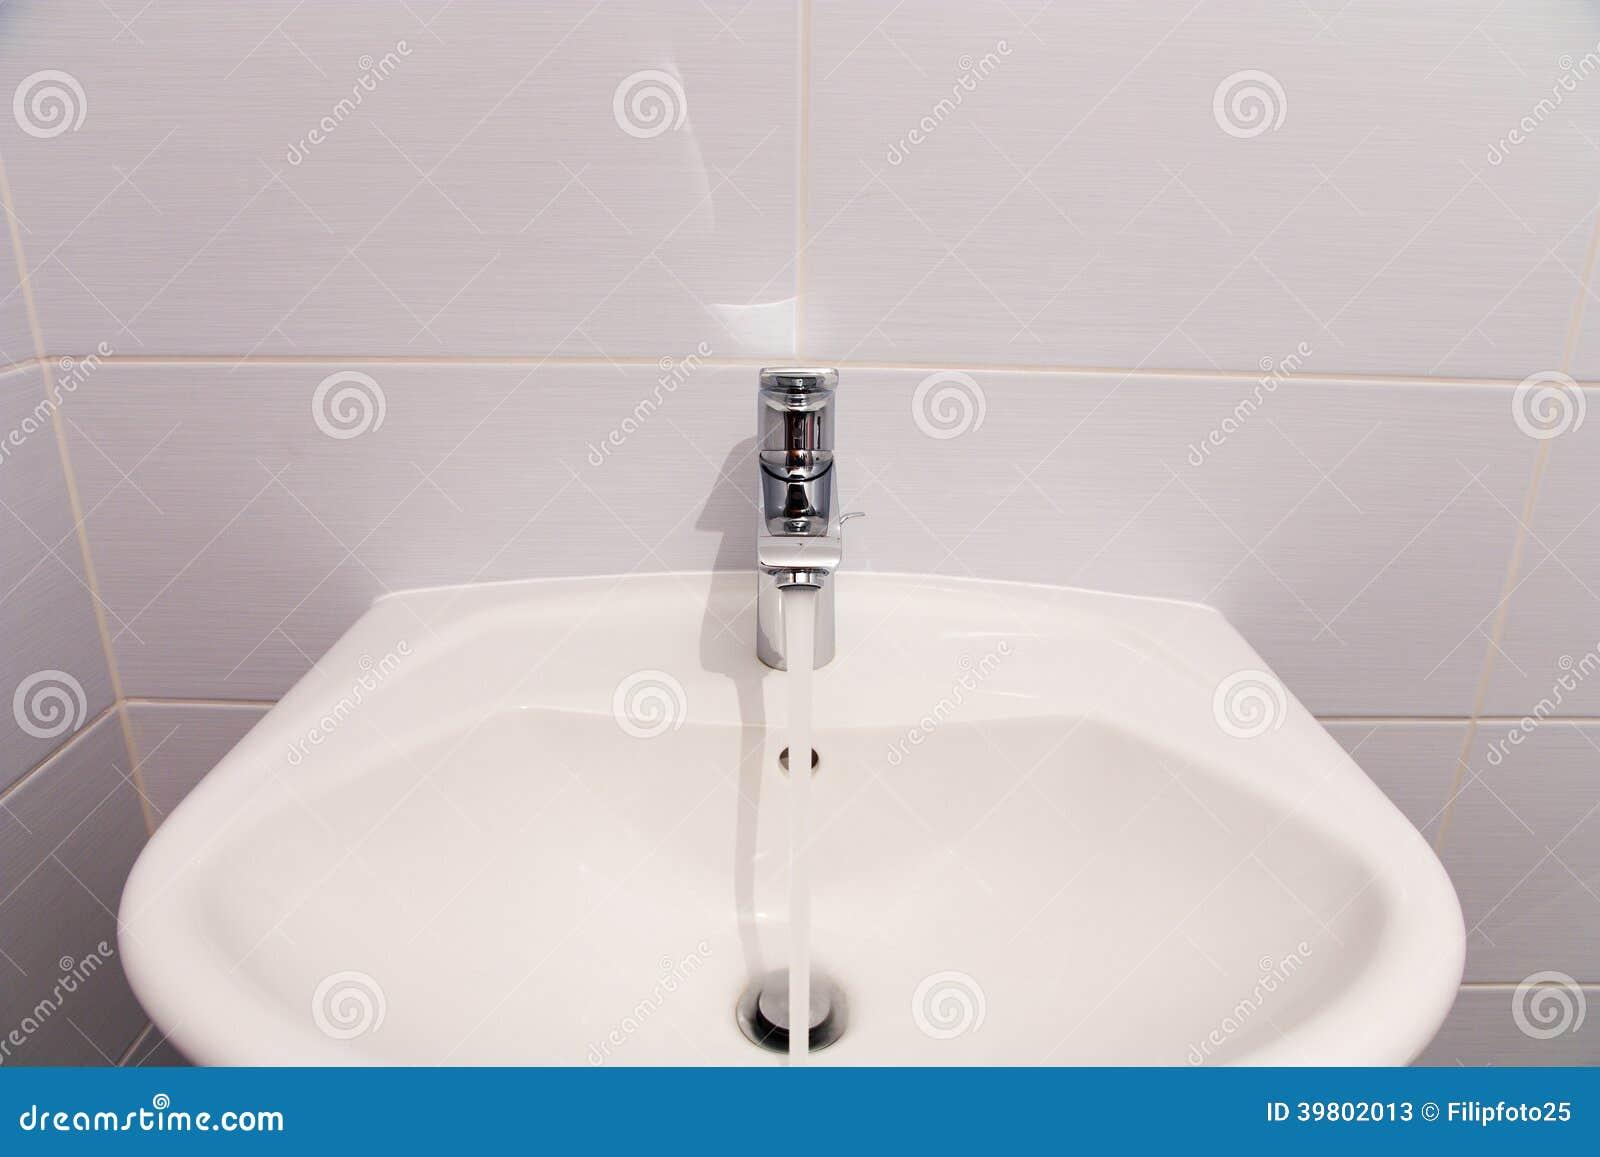 Bathroom tab stock image. Image of interiors, cool, modern - 39802013